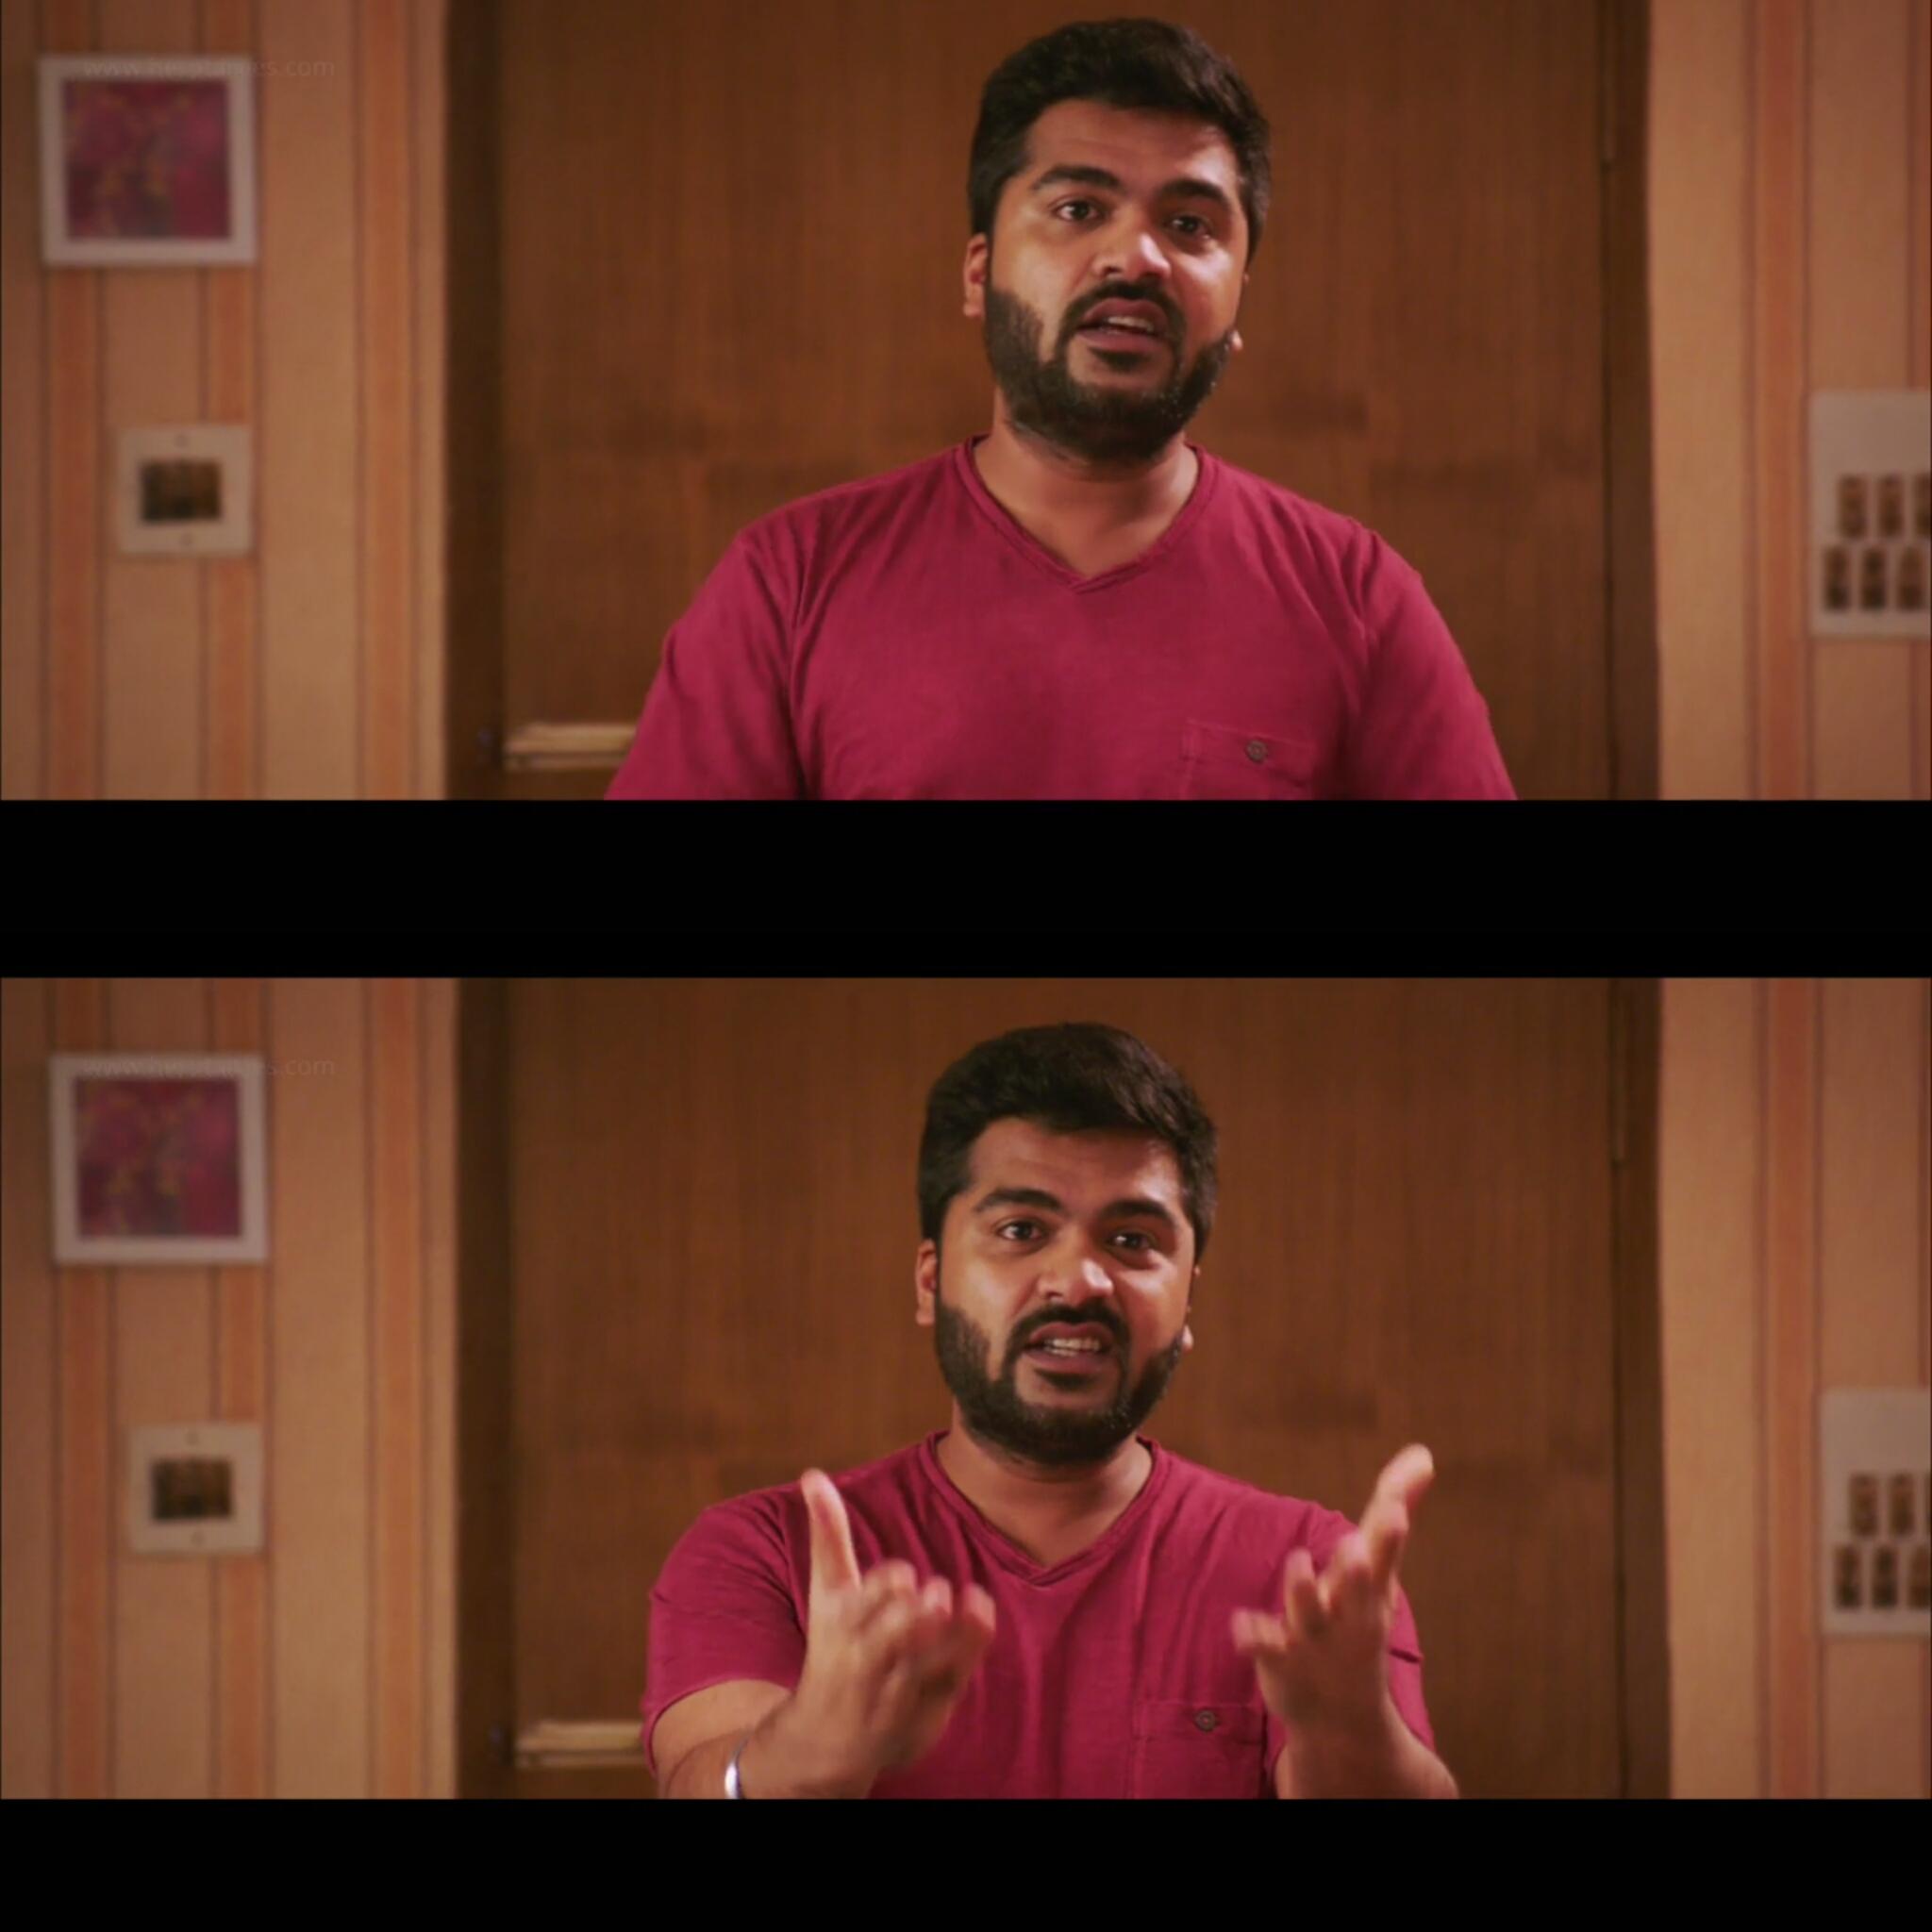 Achcham Yenbadhu Madamaiyada Aym Tamil Meme Templates Koluthi Poduvom